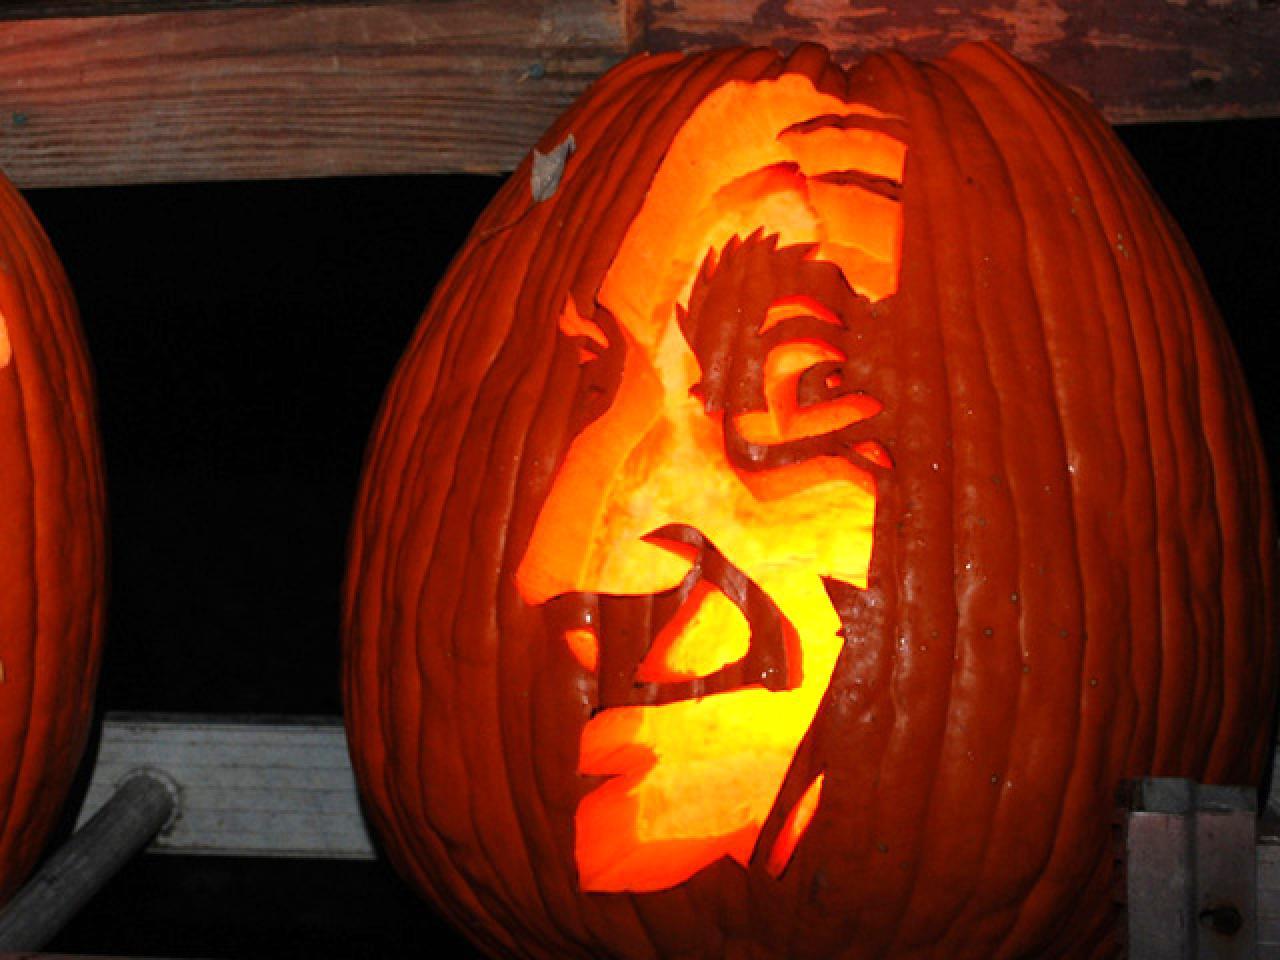 10 amazing jack o 39 lantern masterpieces diy home decor and decorating ideas diy - Breathtaking image of kid halloween decoration using frankestein jack o lantern pumpkin carving ...